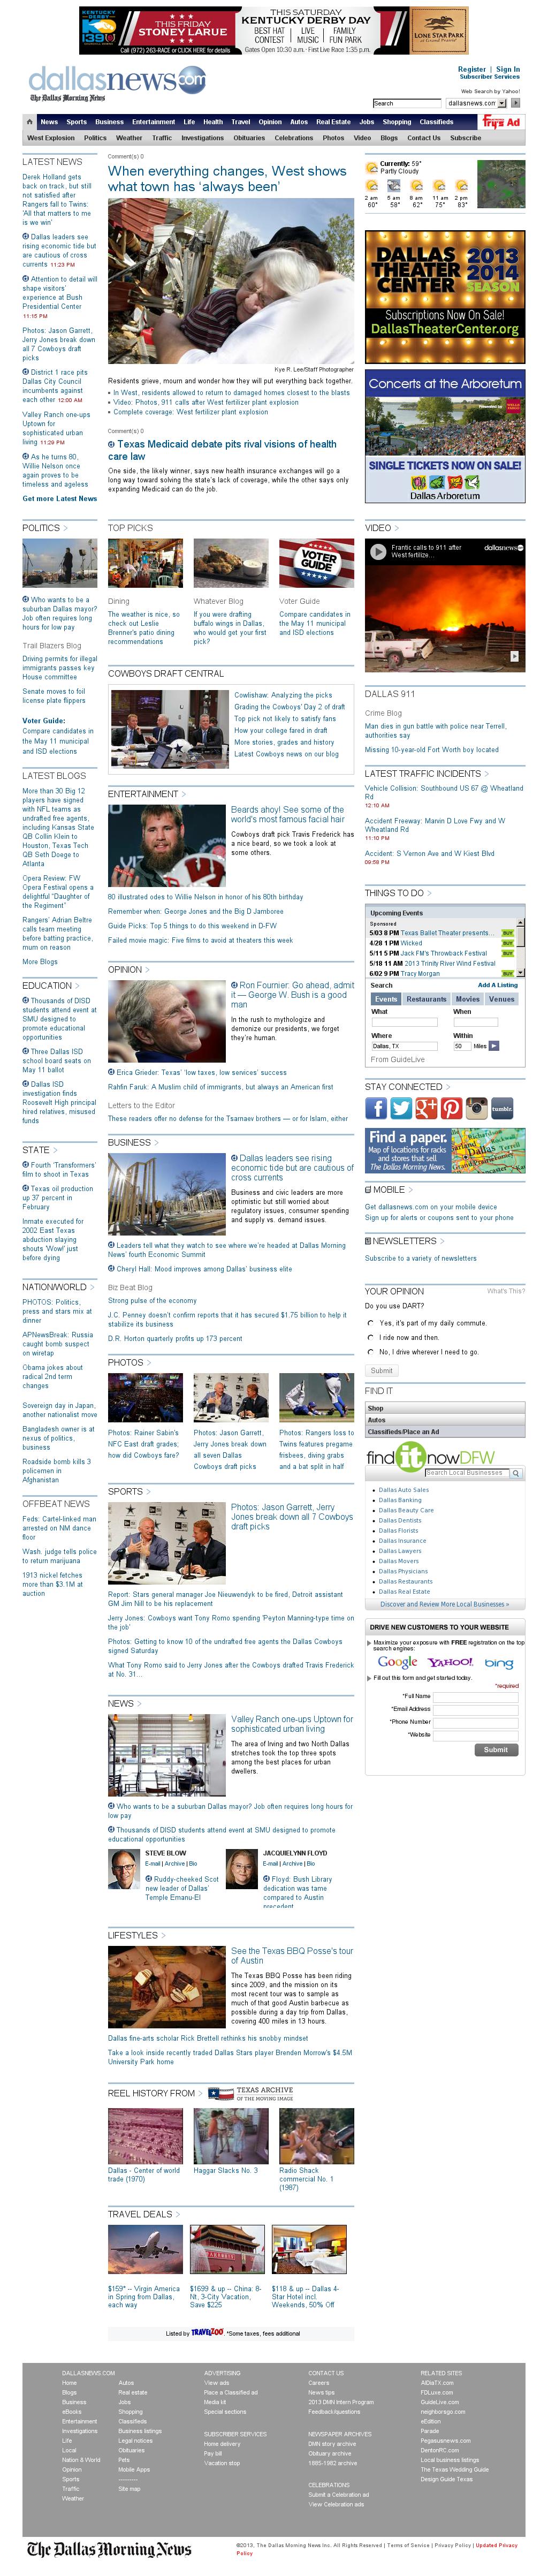 dallasnews.com at Sunday April 28, 2013, 6:04 a.m. UTC